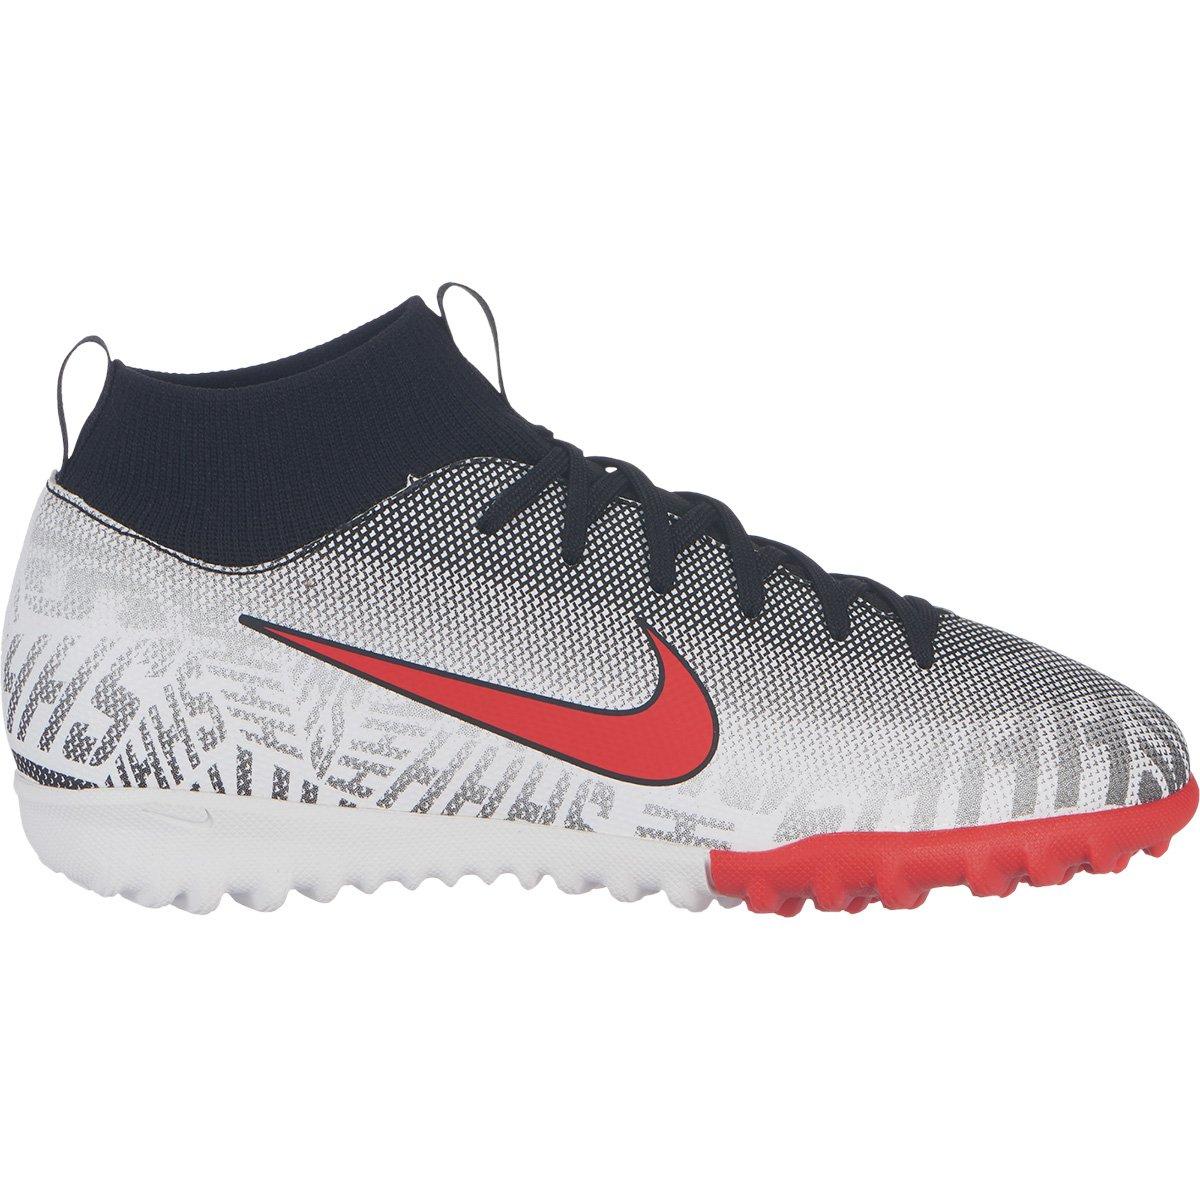 77de8aa7cd Chuteira Society Infantil Nike Mercurial Superfly 6 Academy Gs Neymar Jr TF  - Branco e Vermelho